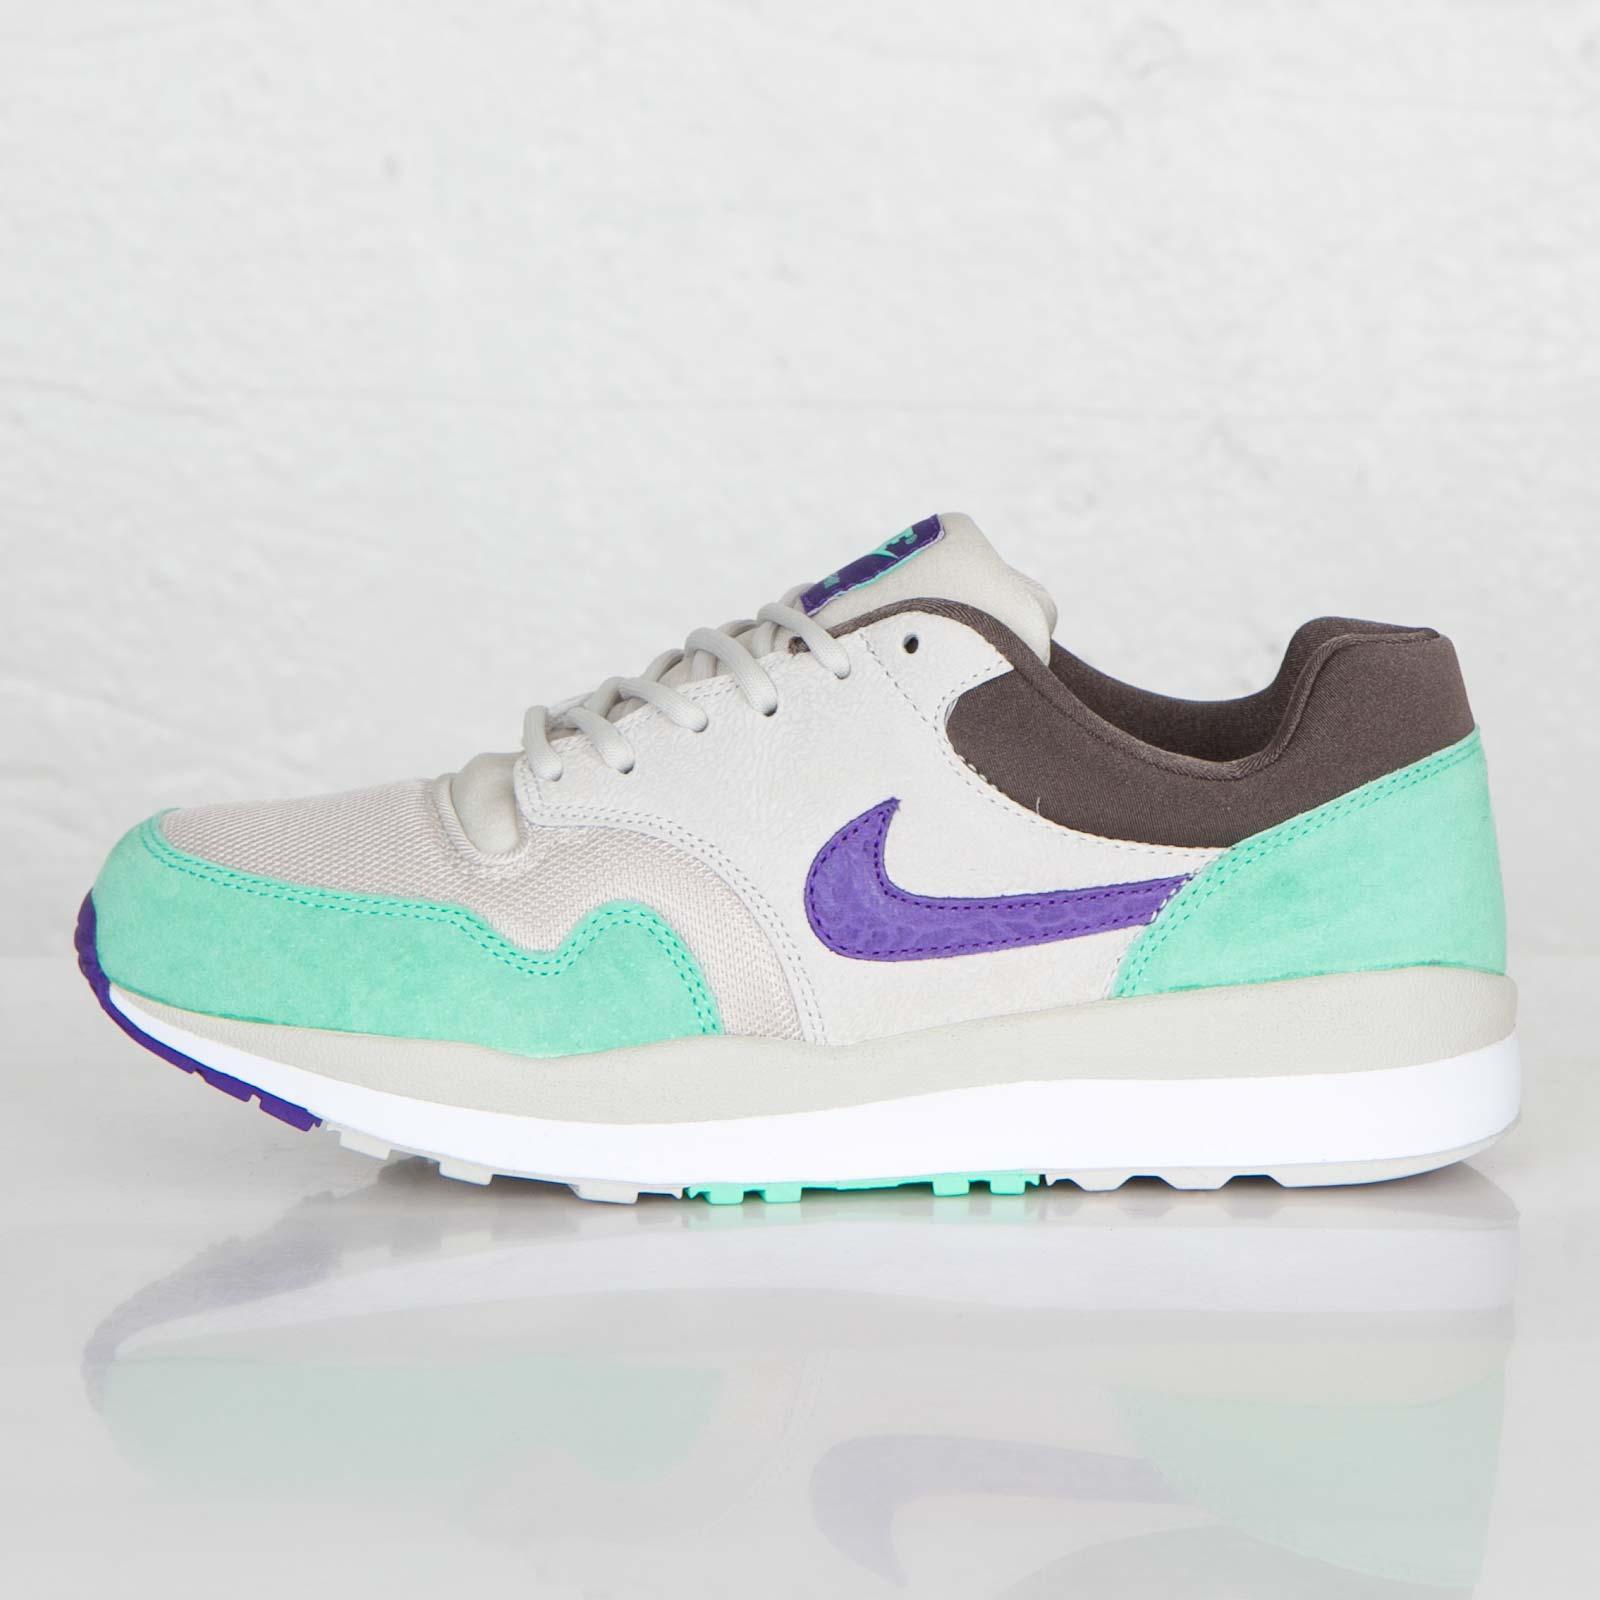 low priced 4935d 9e34d ... Nike Air Safari ...